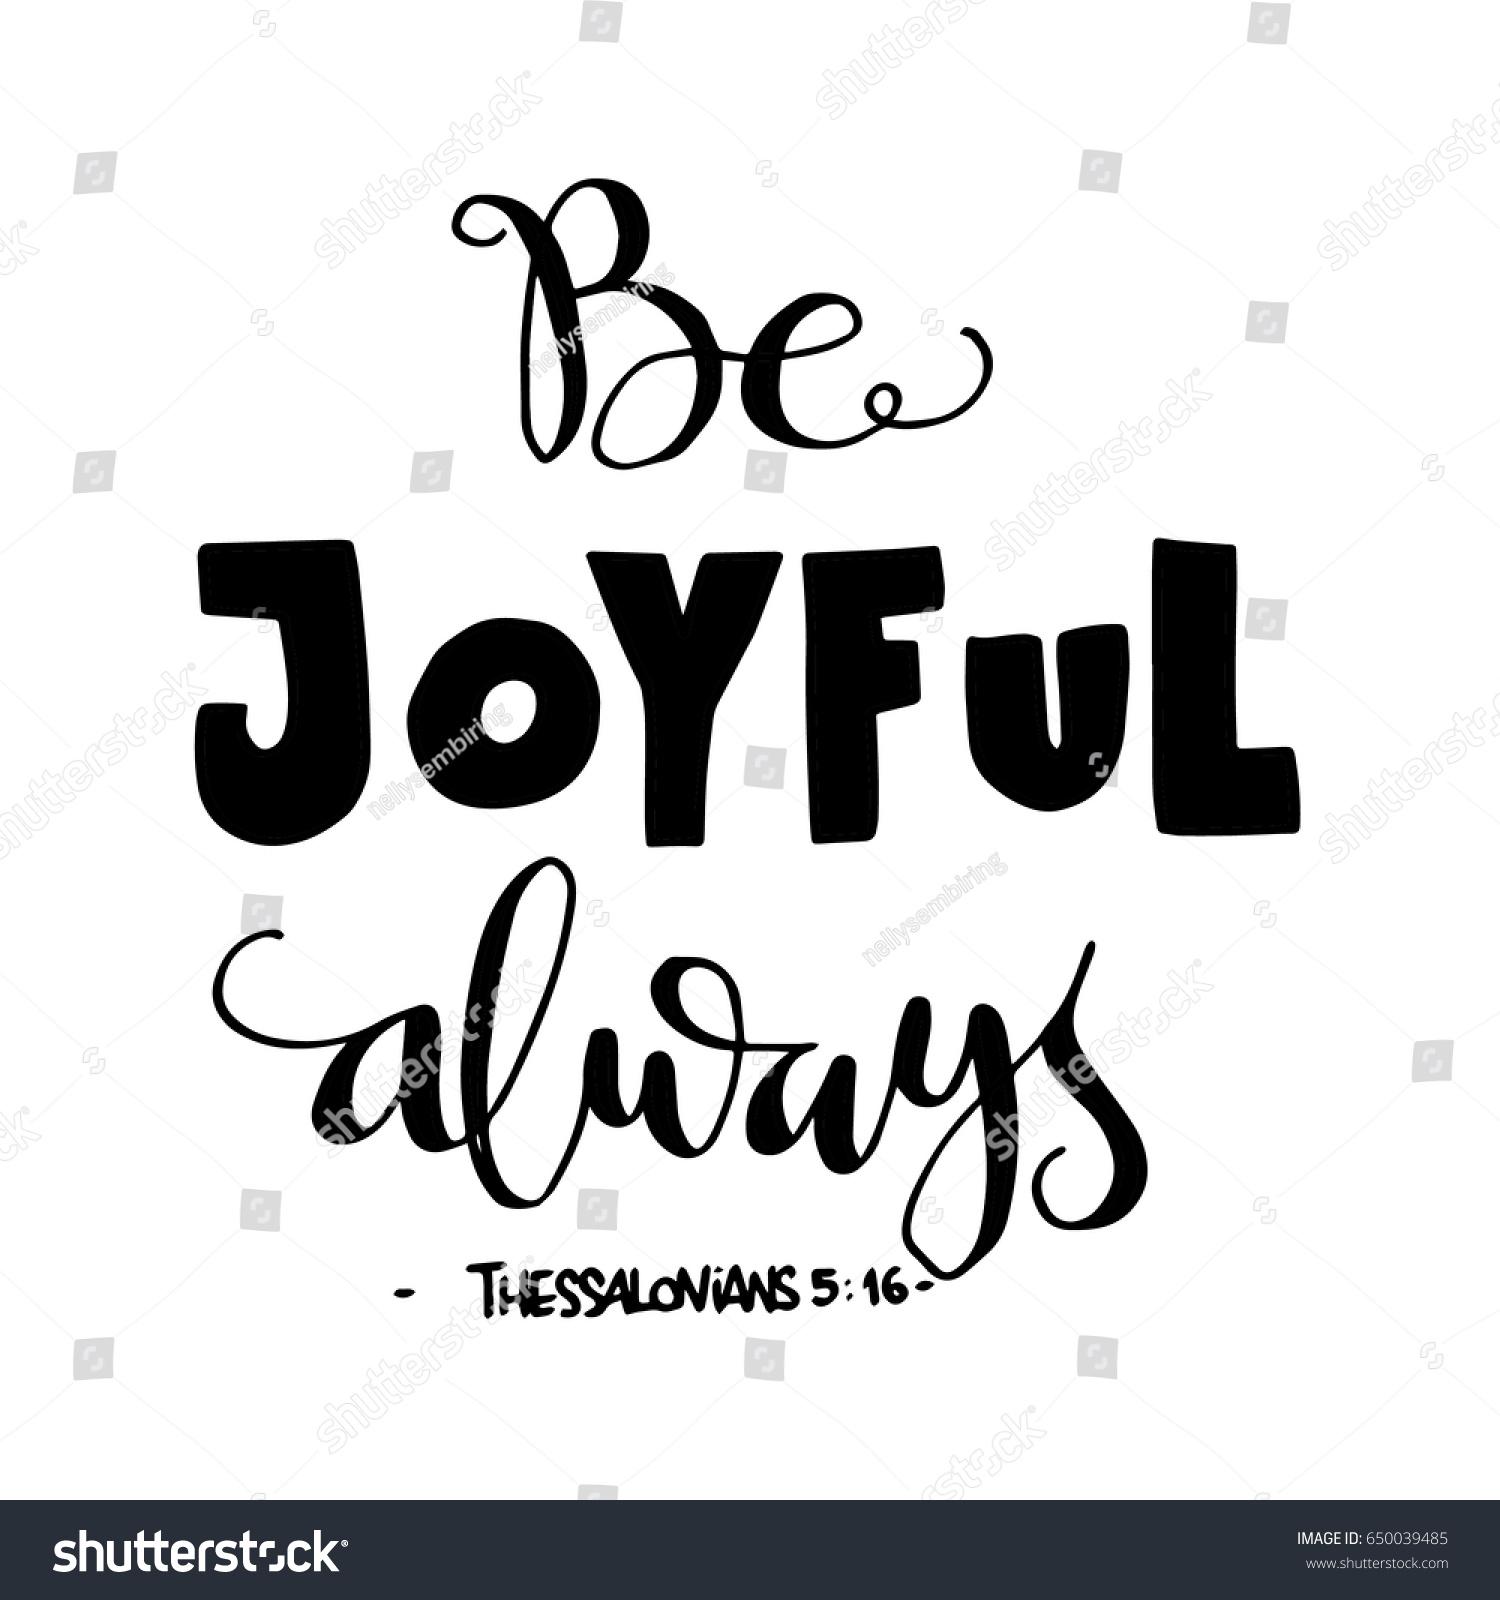 Be joyful bible verse hand lettered stock vector